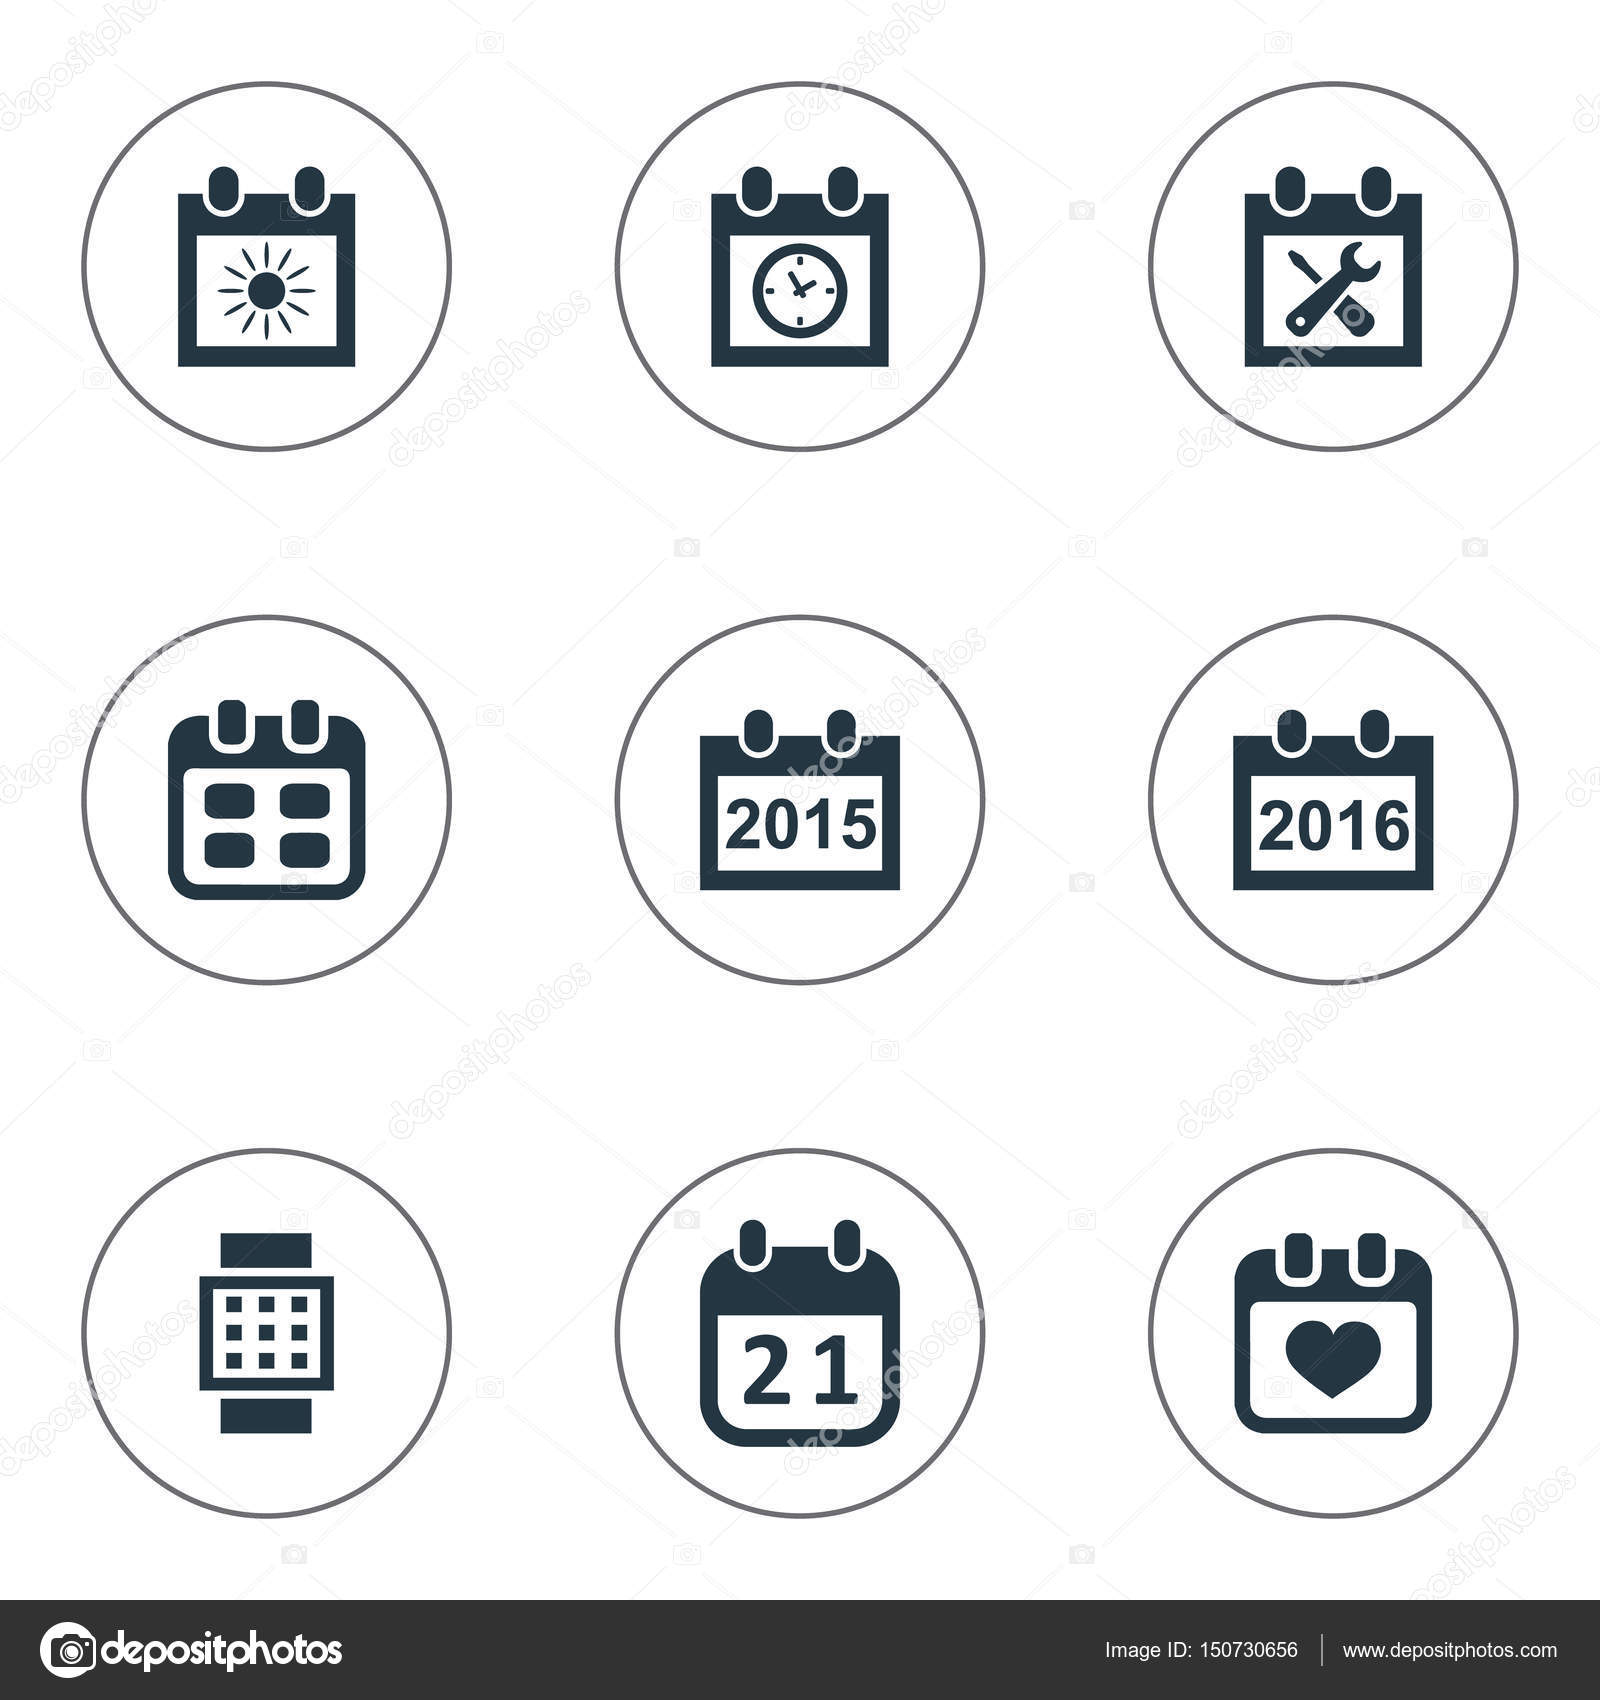 Annual Agenda | Vector Illustration Set Of Simple Calendar Icons Elements